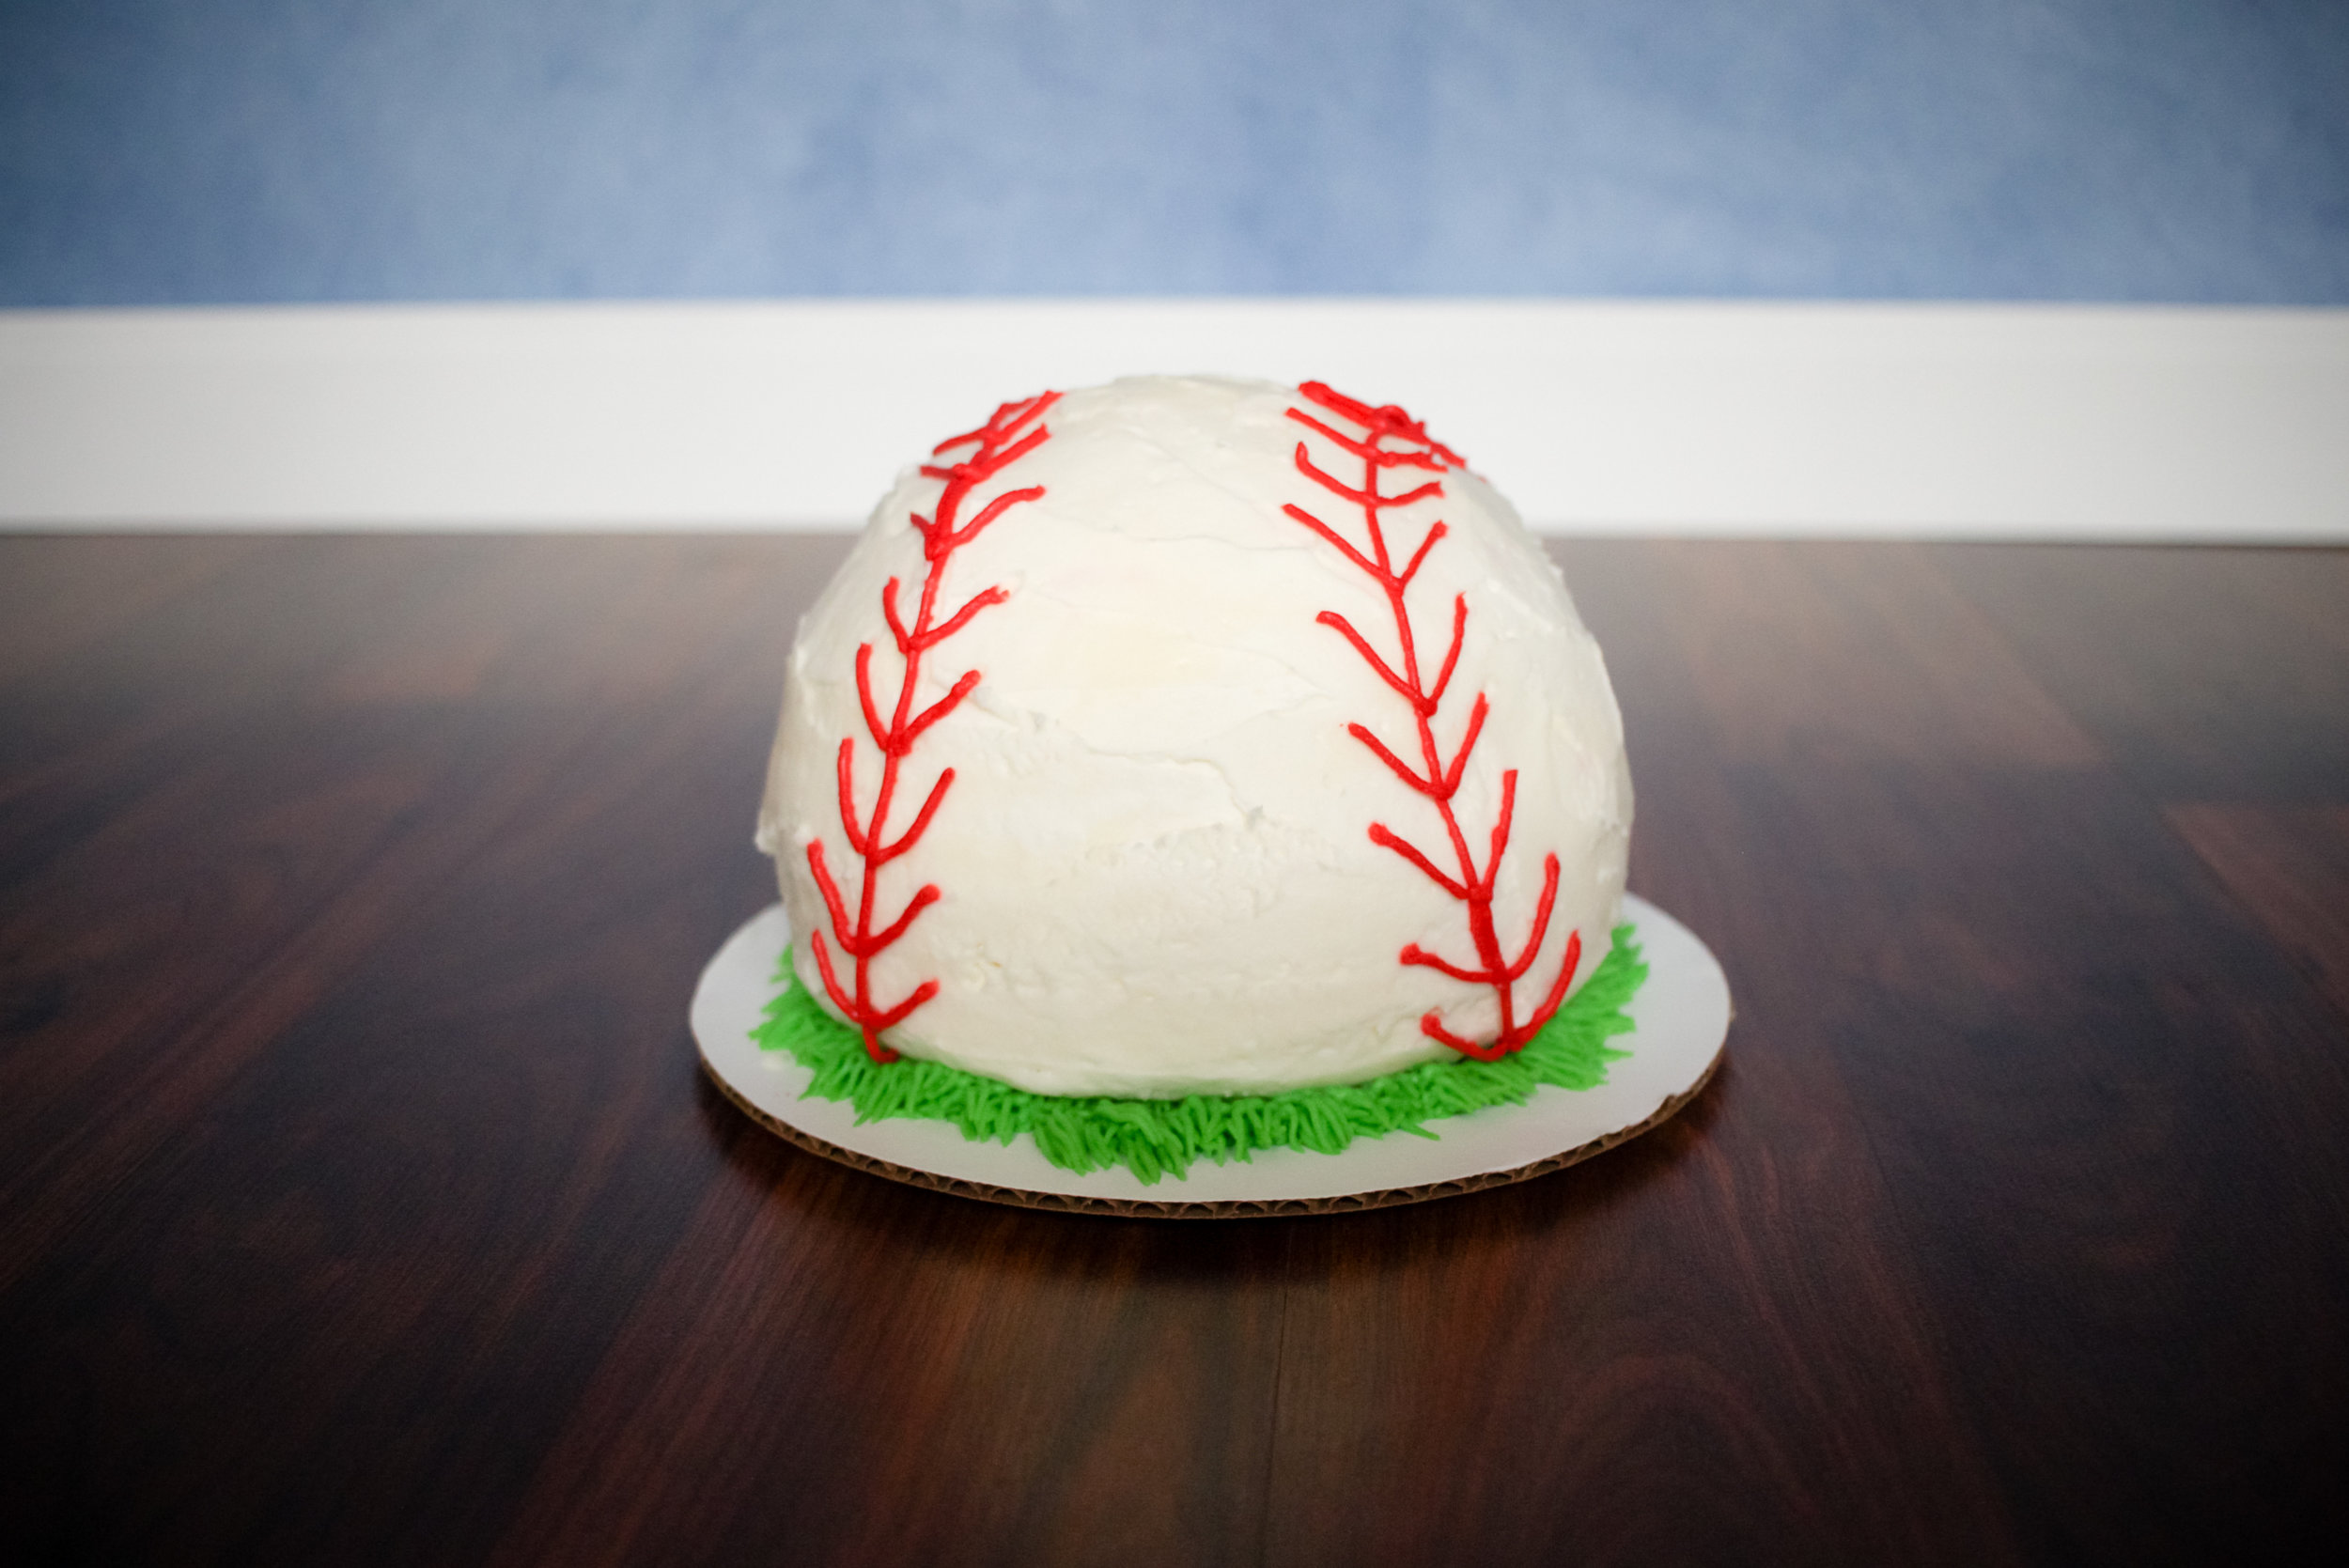 That cake!!